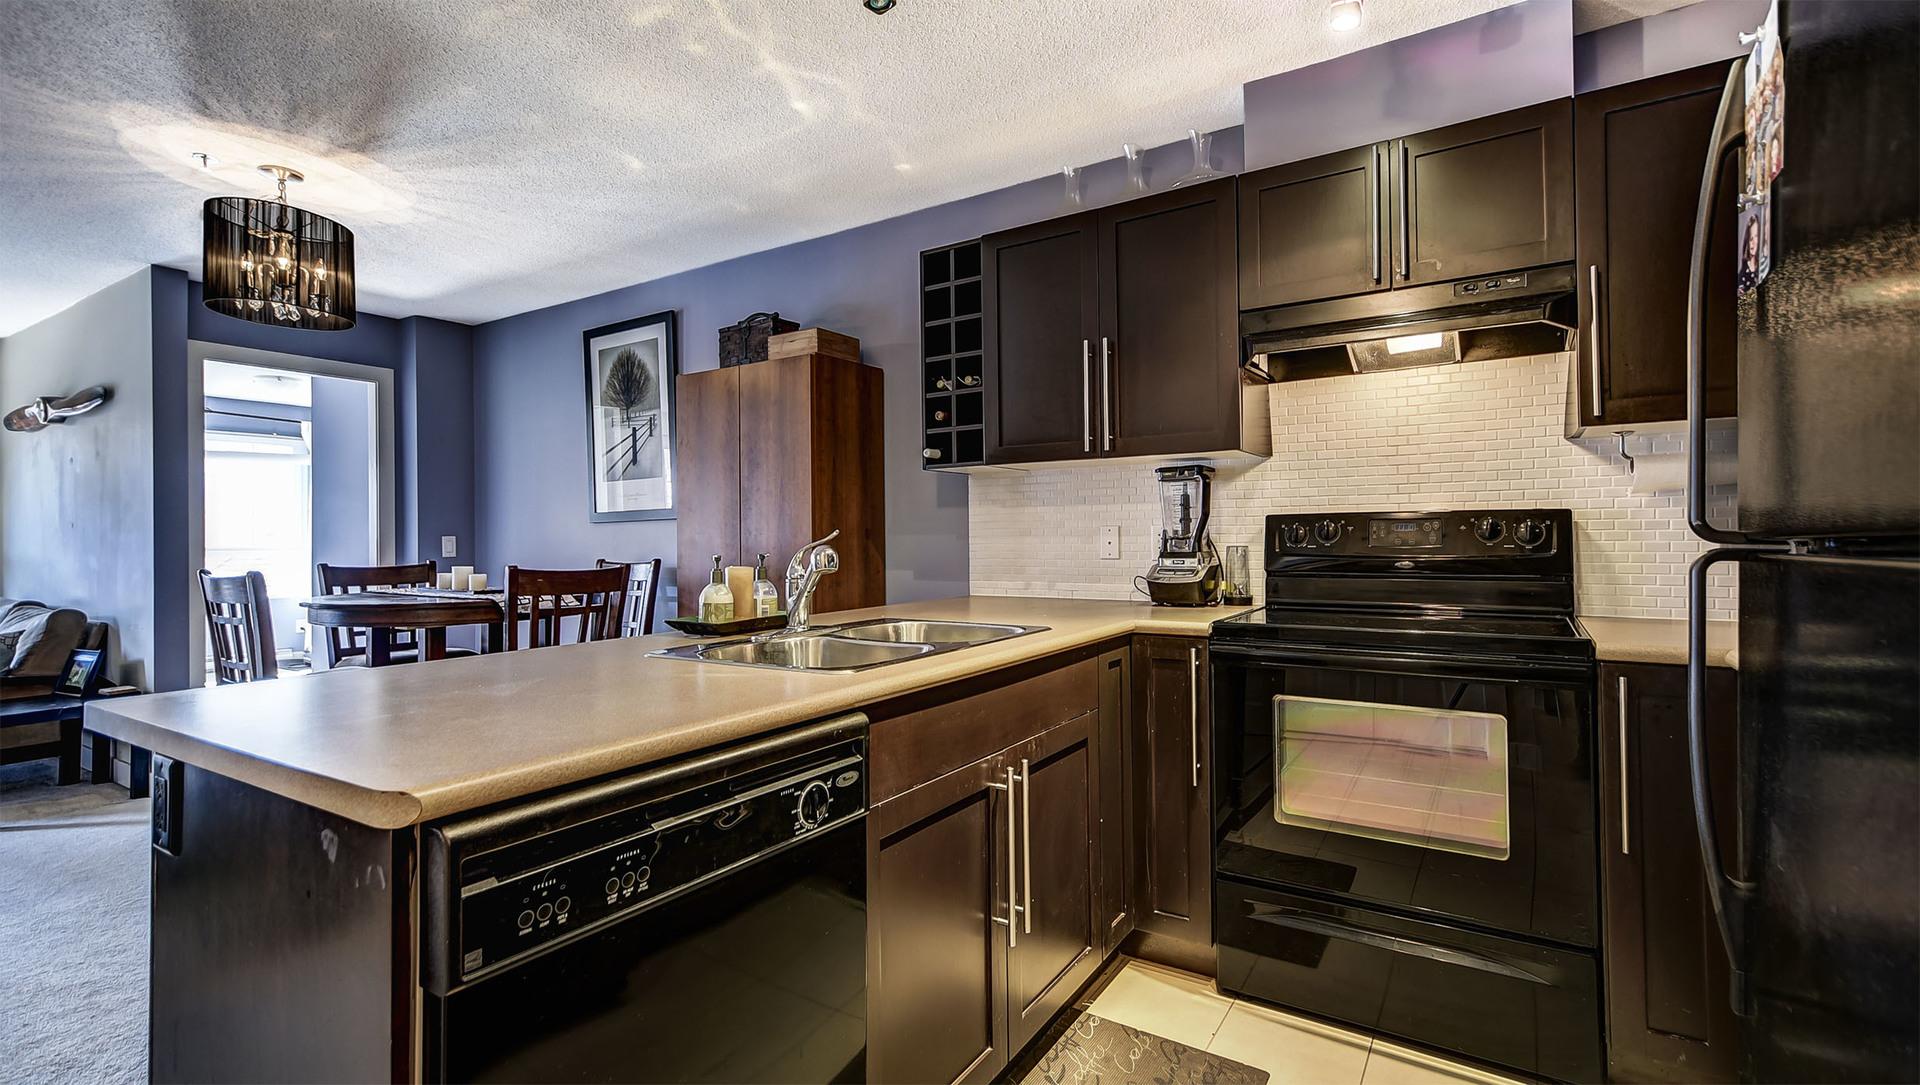 Kelowna Real Estate at 308 - 1083 Sunset Drive, Kelowna, Central Okanagan